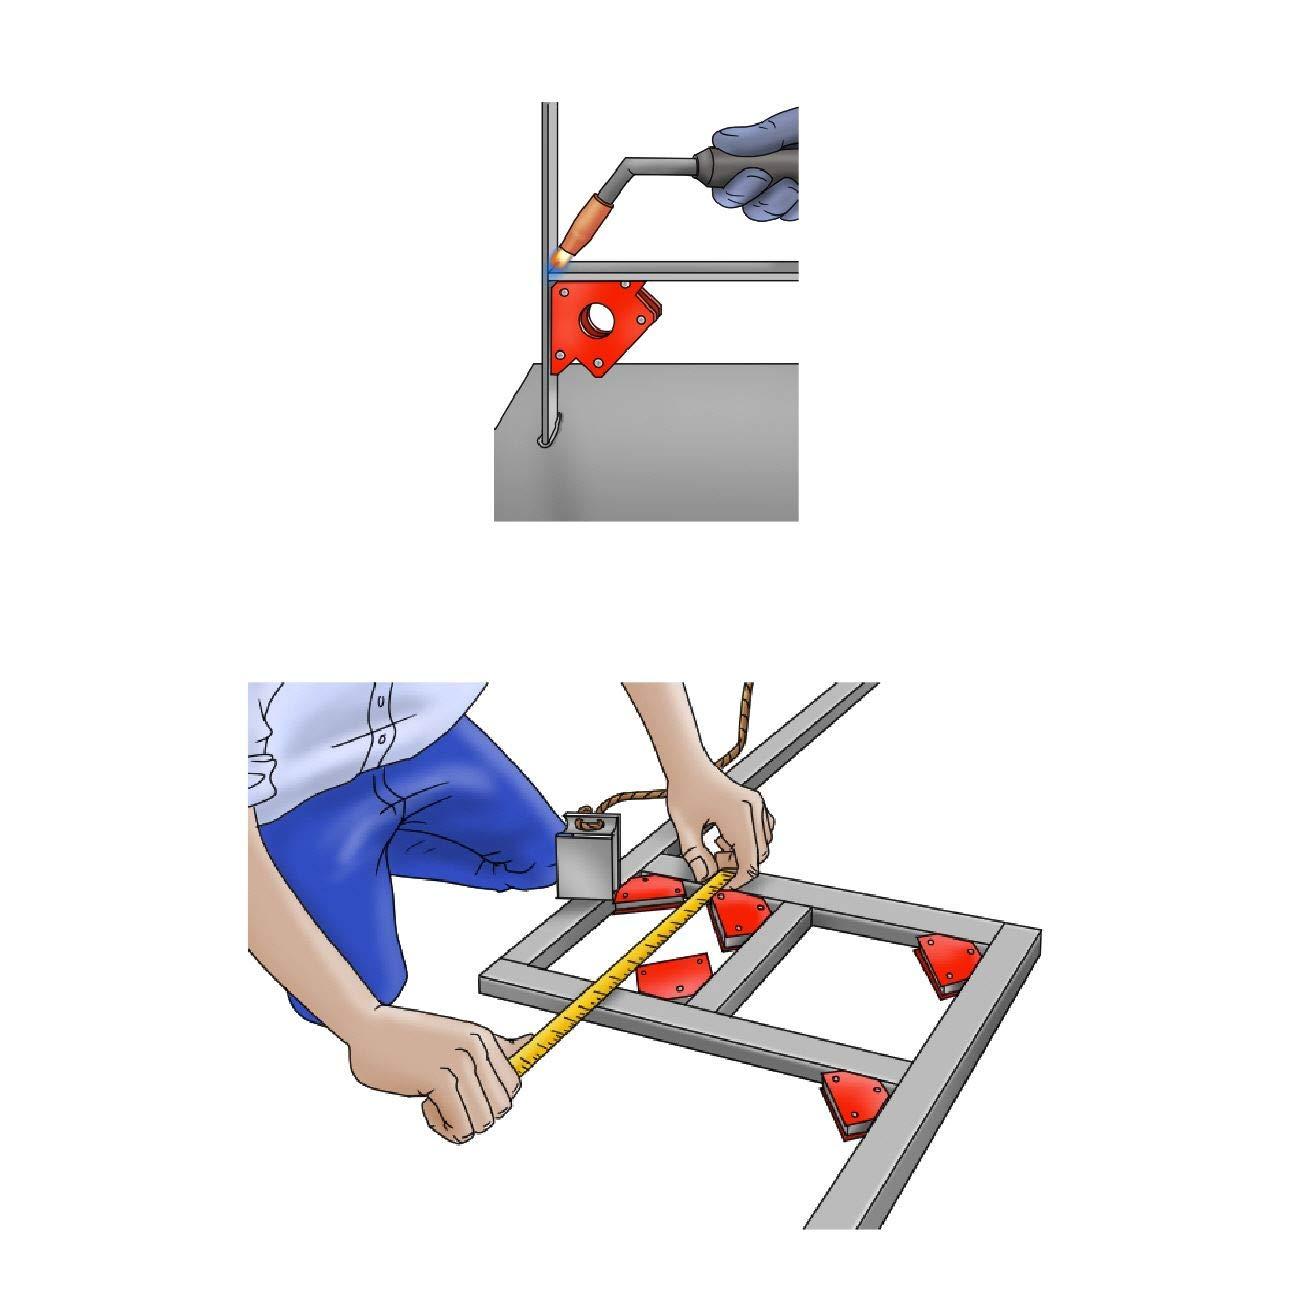 Welding Magnet 75mm Strong 18lb Magnetic Angled Soldering Metal Work Holder